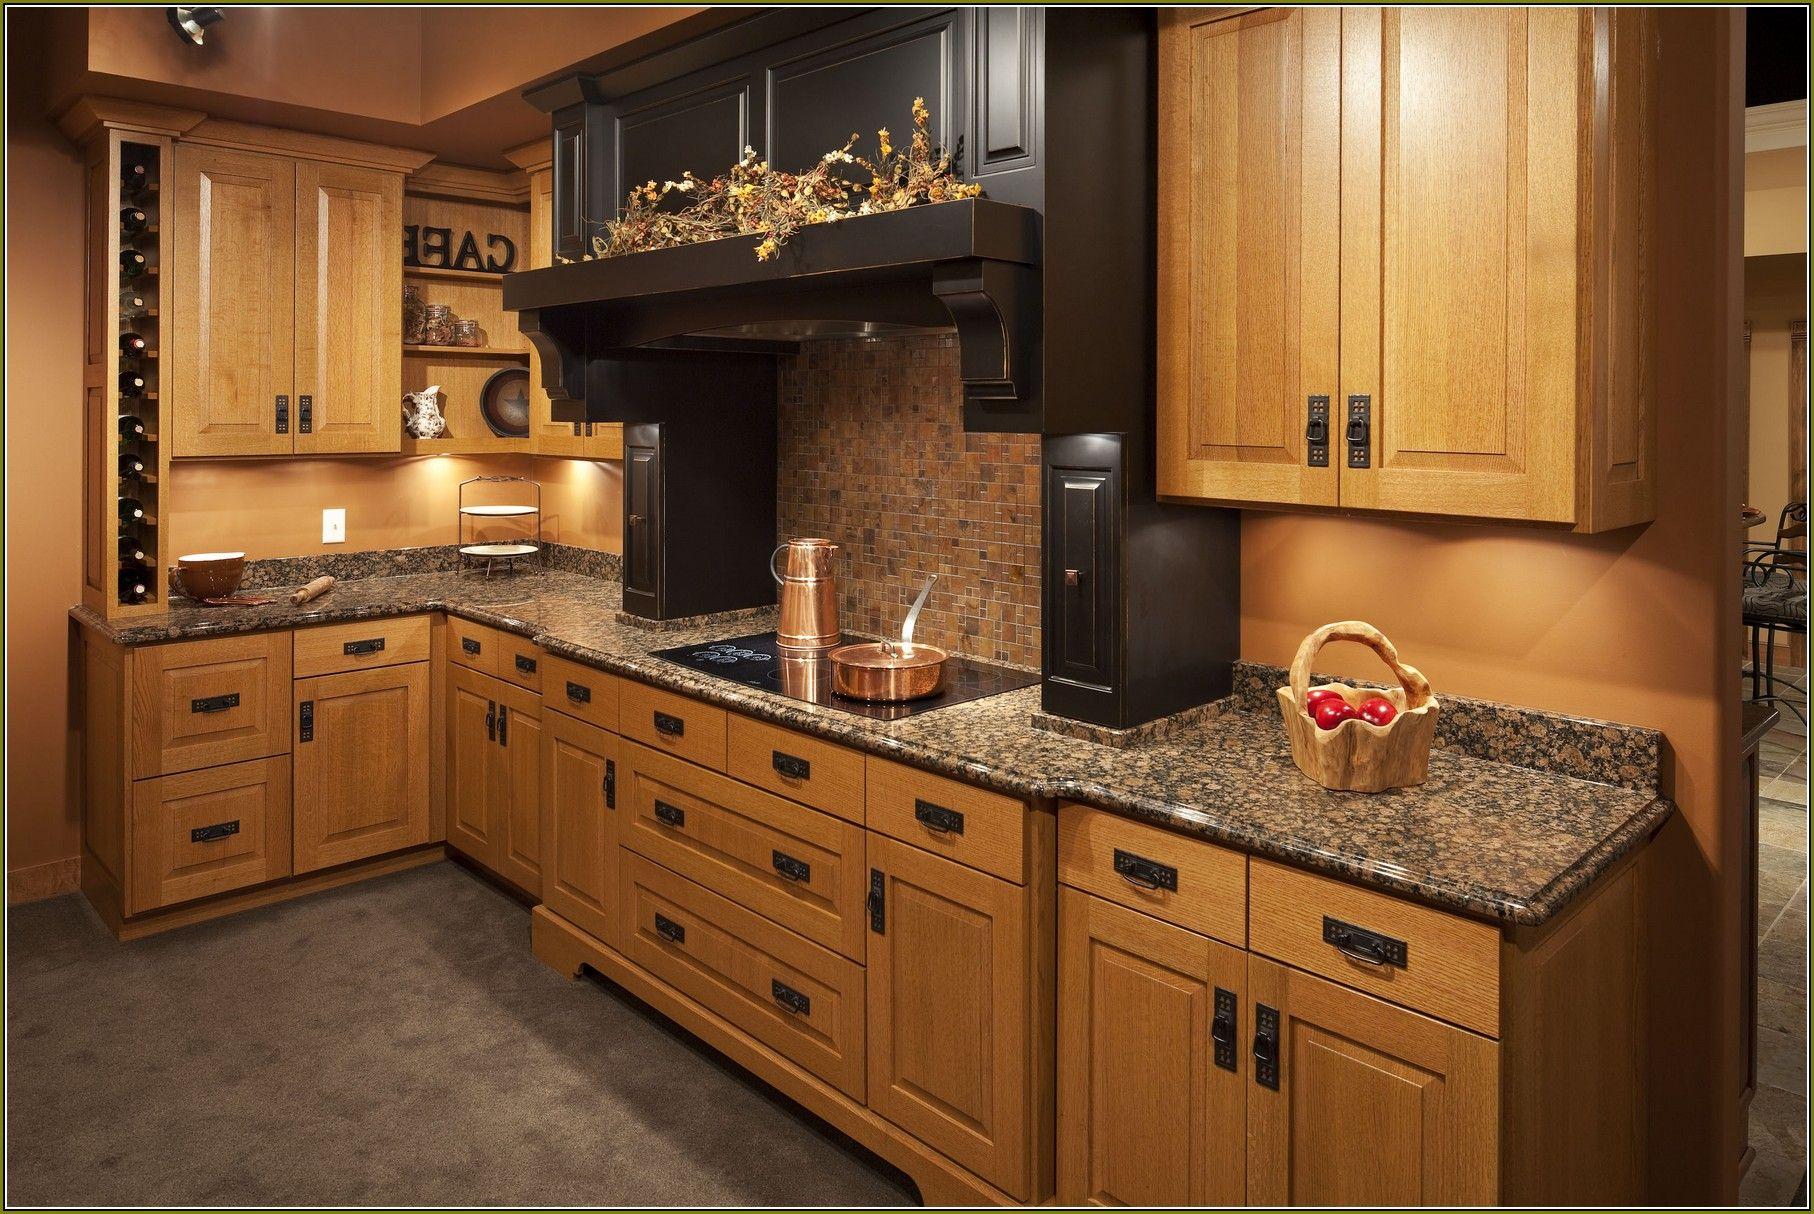 craftsman style kitchen hardware aid crock pot mission cabinet doors remodel